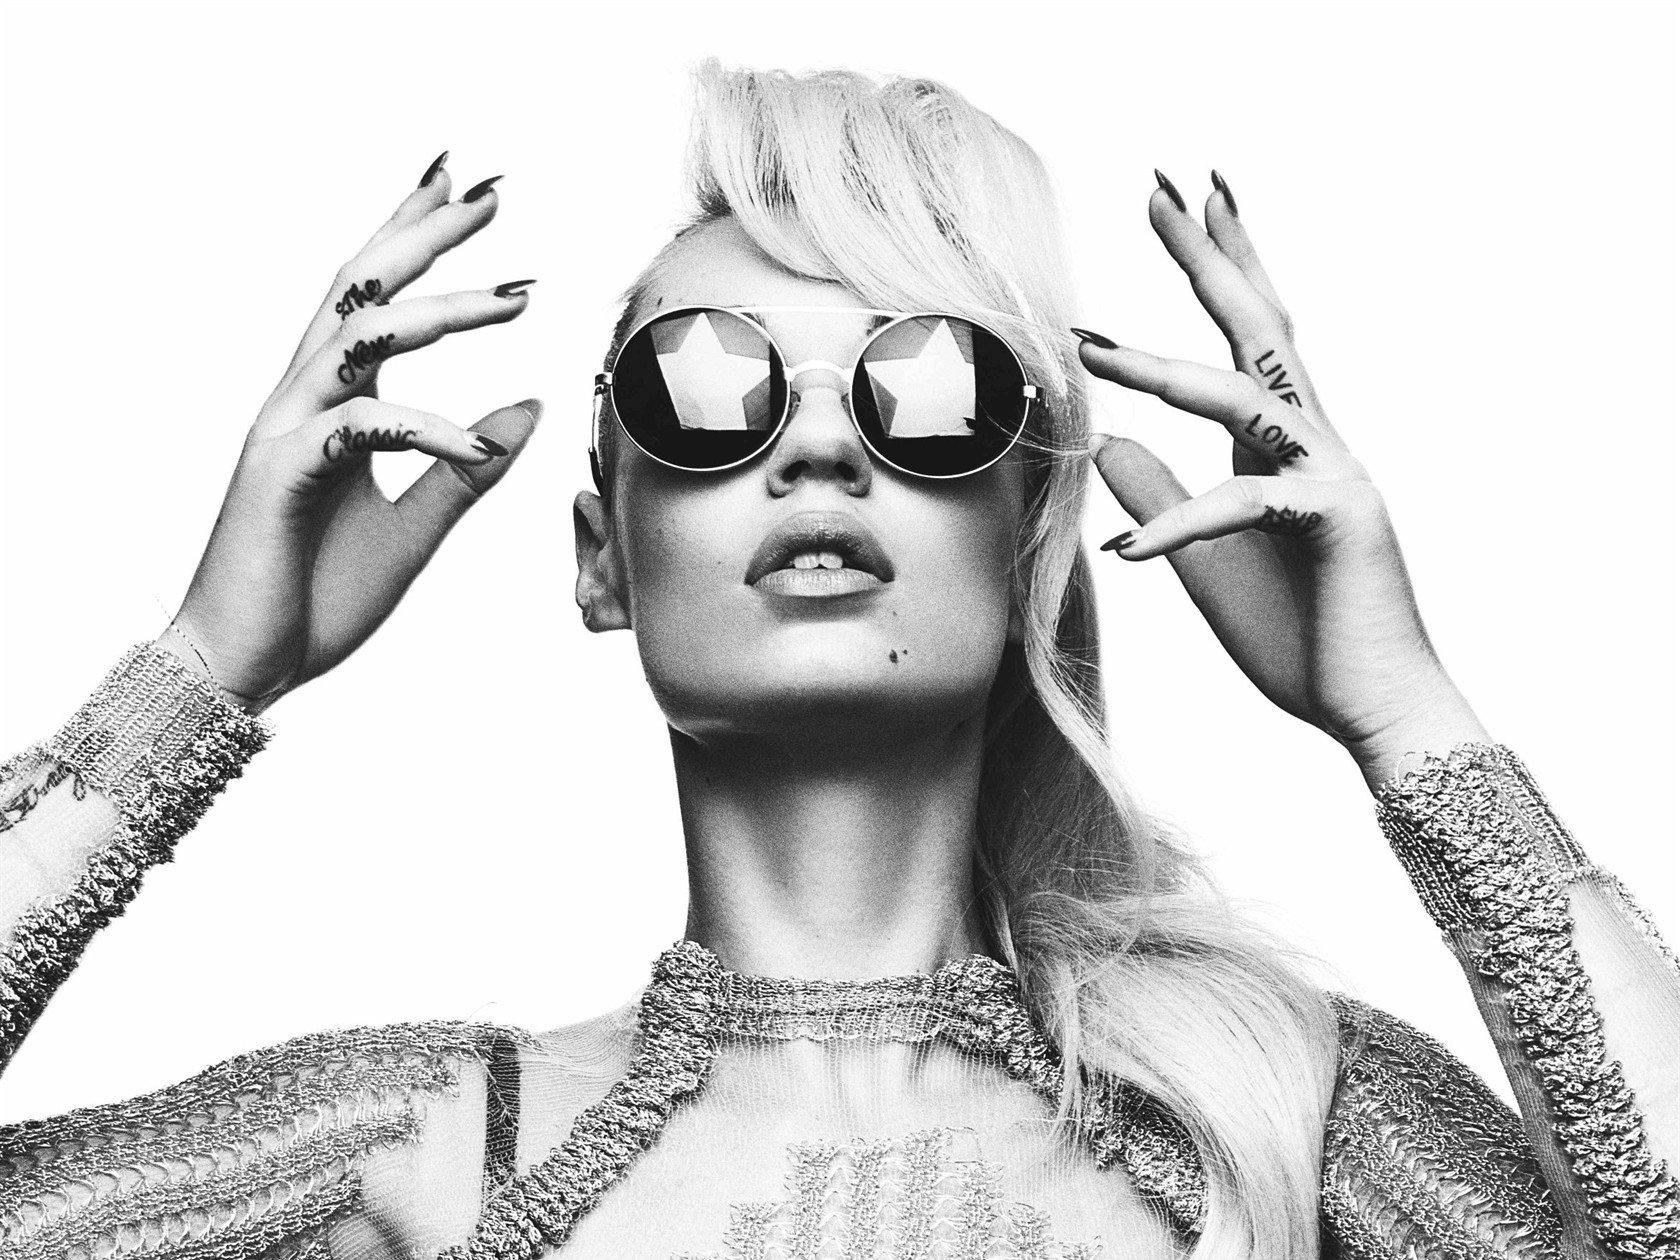 iggy azalea hip hop electronic dance pop babe rap rapper (47